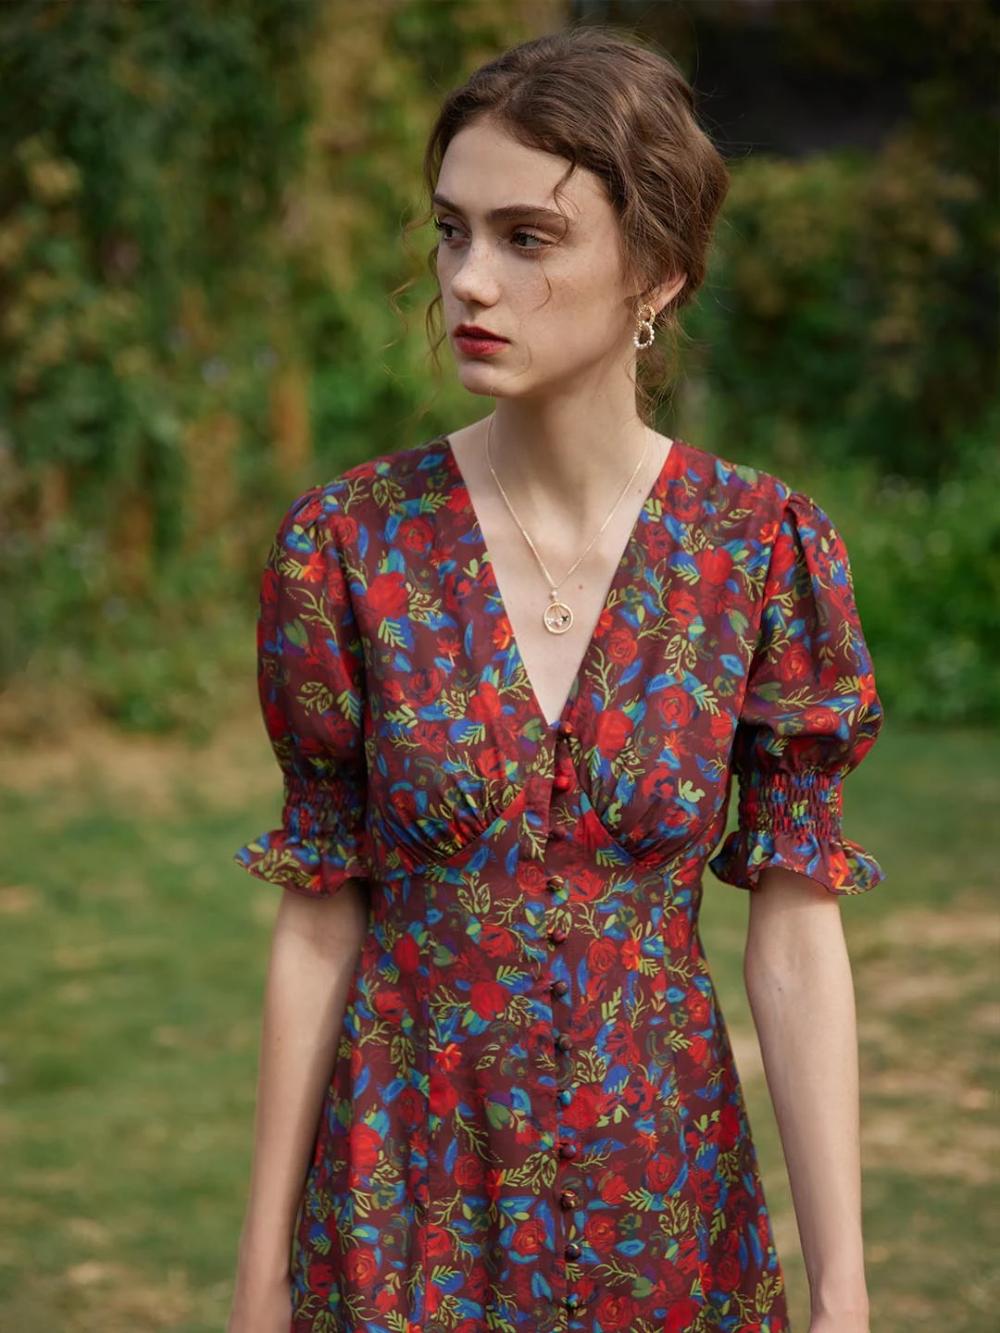 Kora Floral Printed Midi Dress In 2021 Quirky Dress Printed Midi Dress Dresses [ 1333 x 1000 Pixel ]